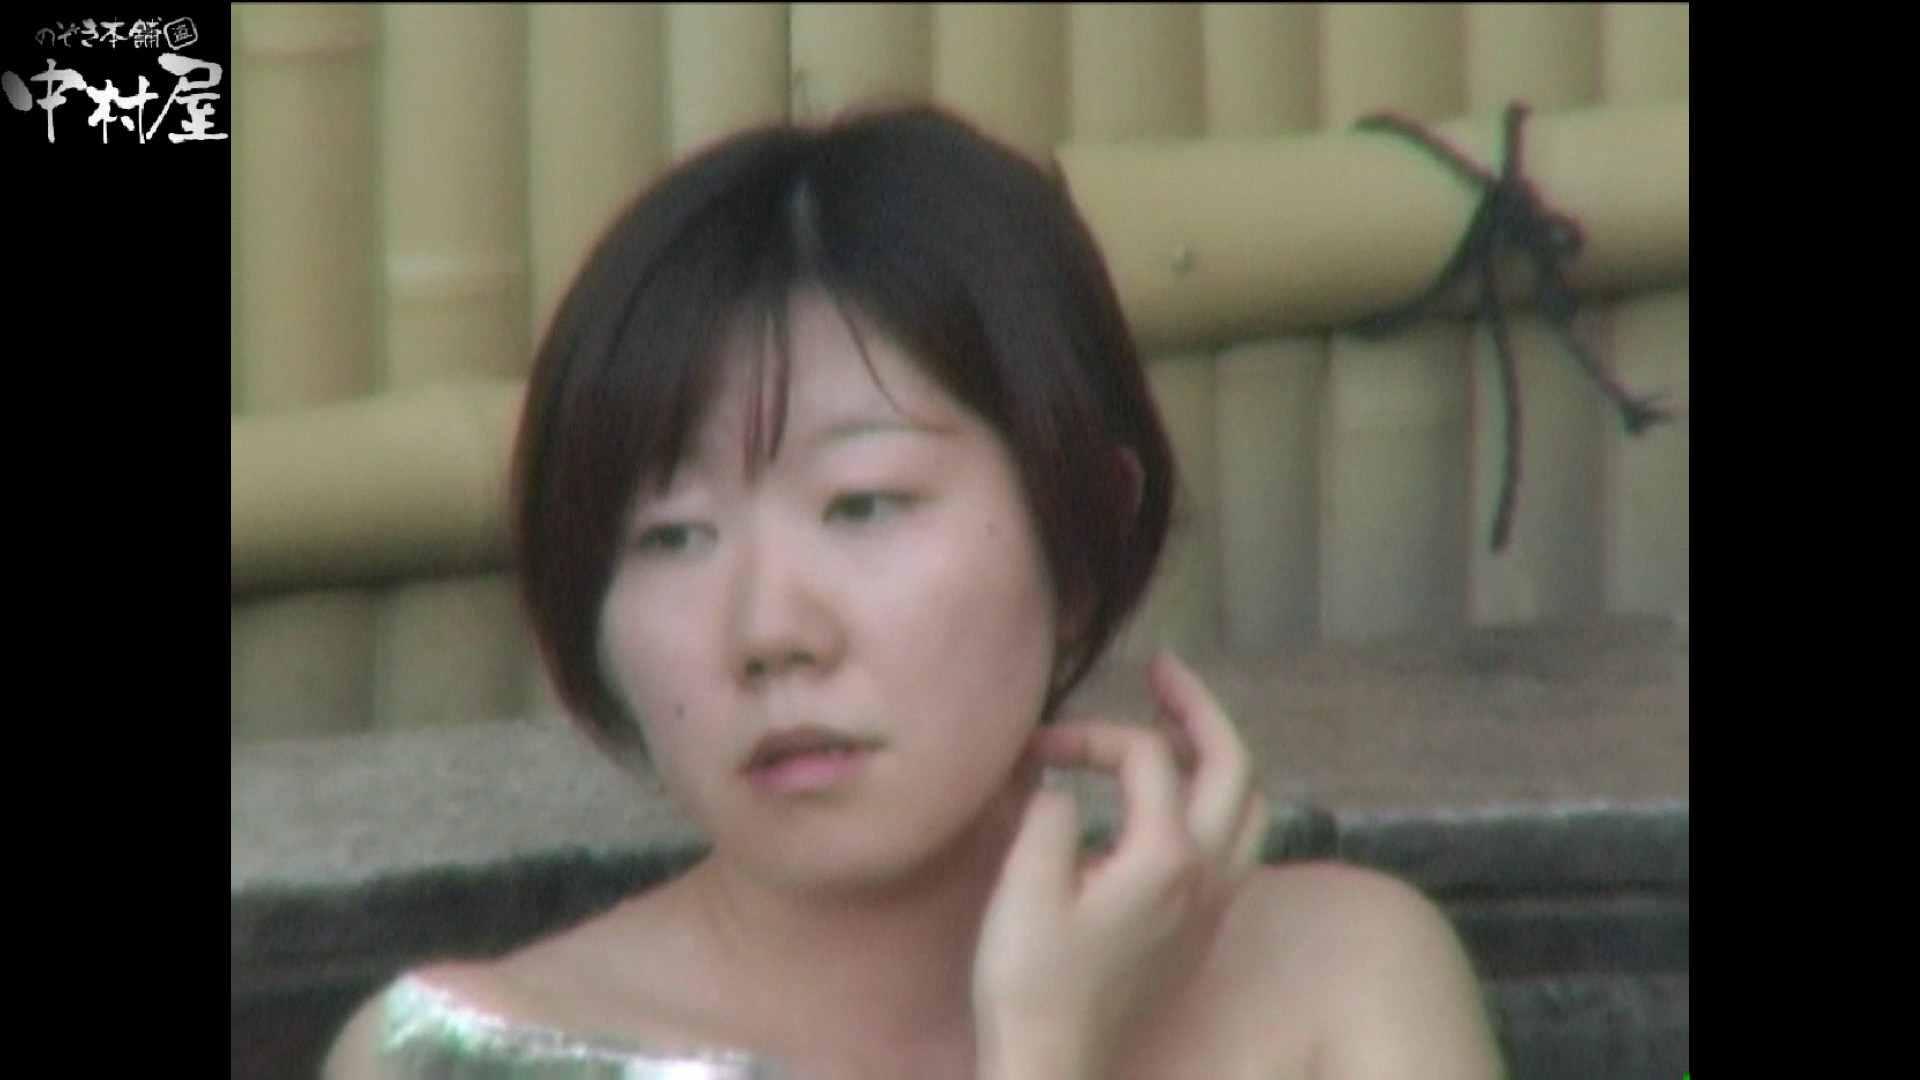 Aquaな露天風呂Vol.977 盗撮師作品  83pic 15